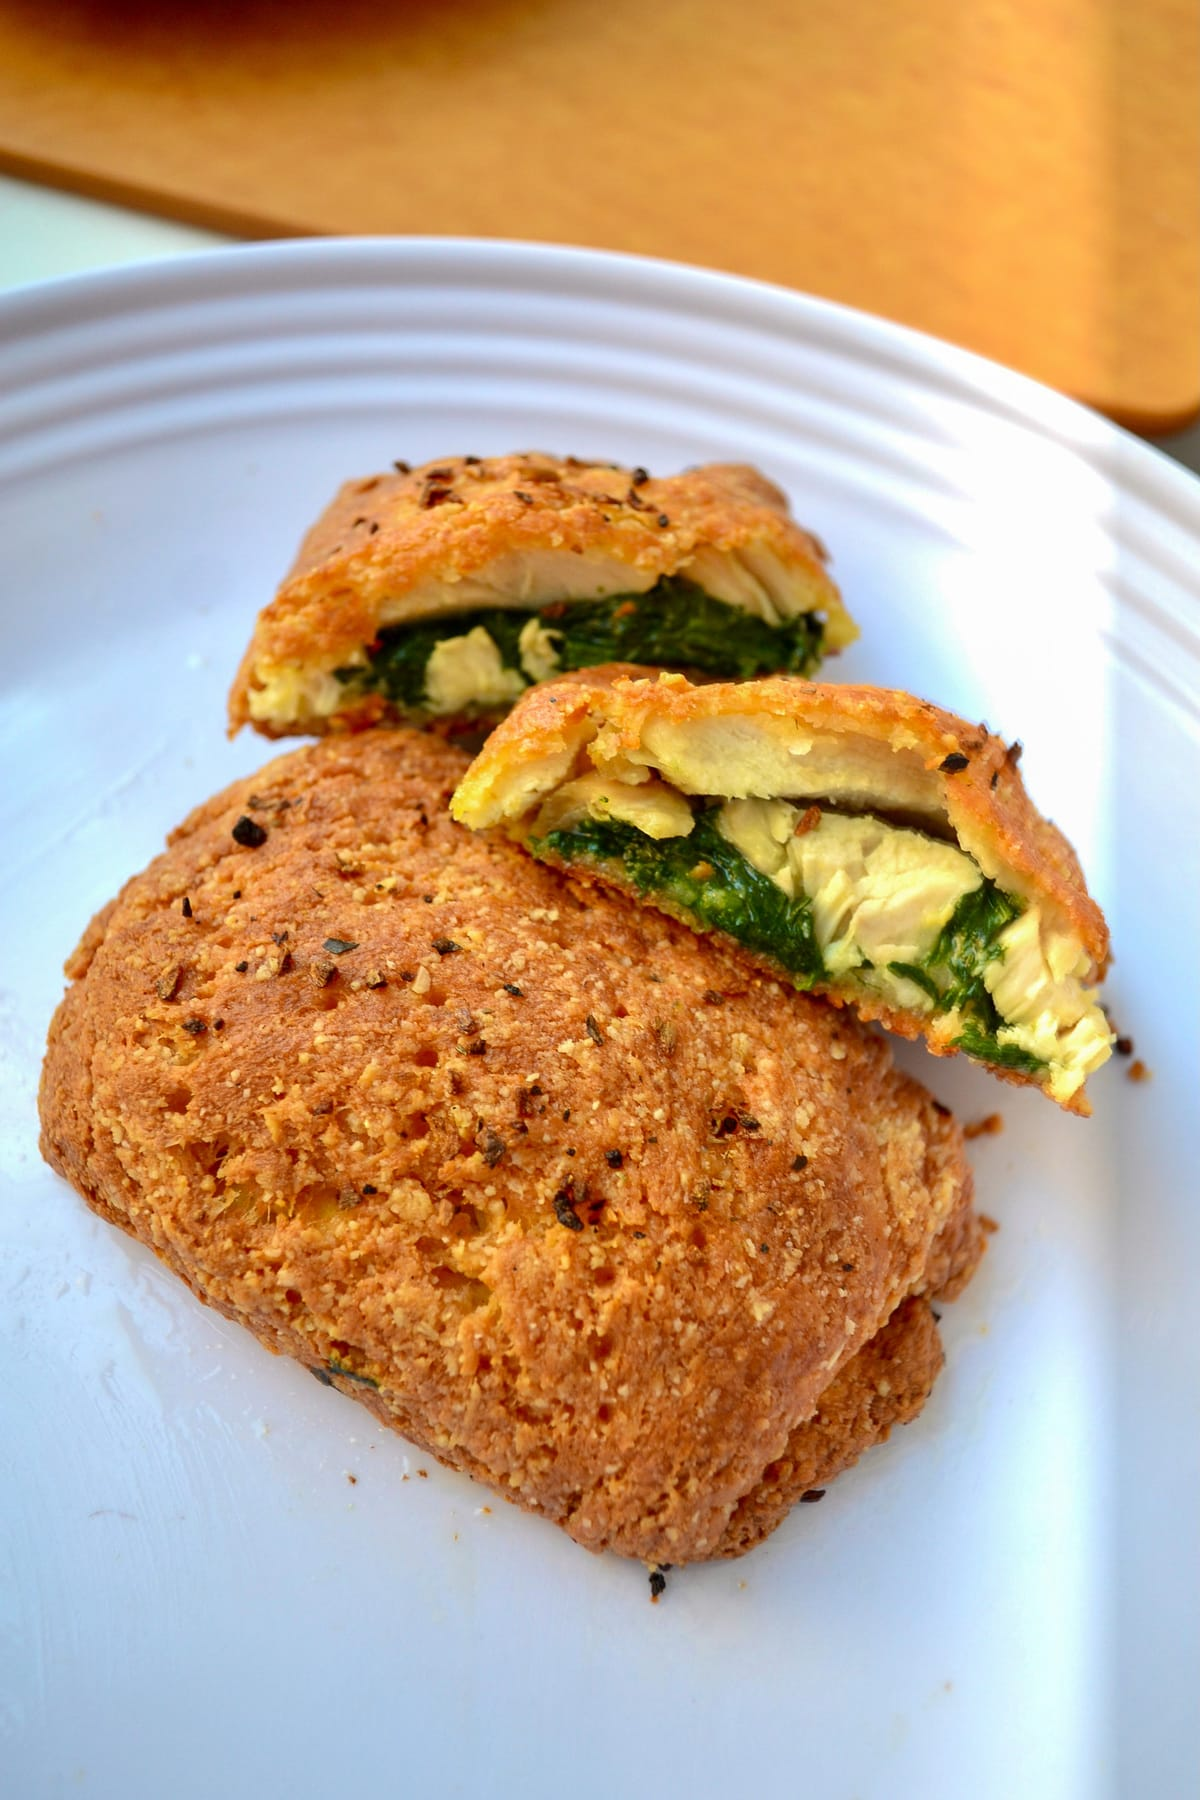 Keto Breakfast Hot Pockets with veggies